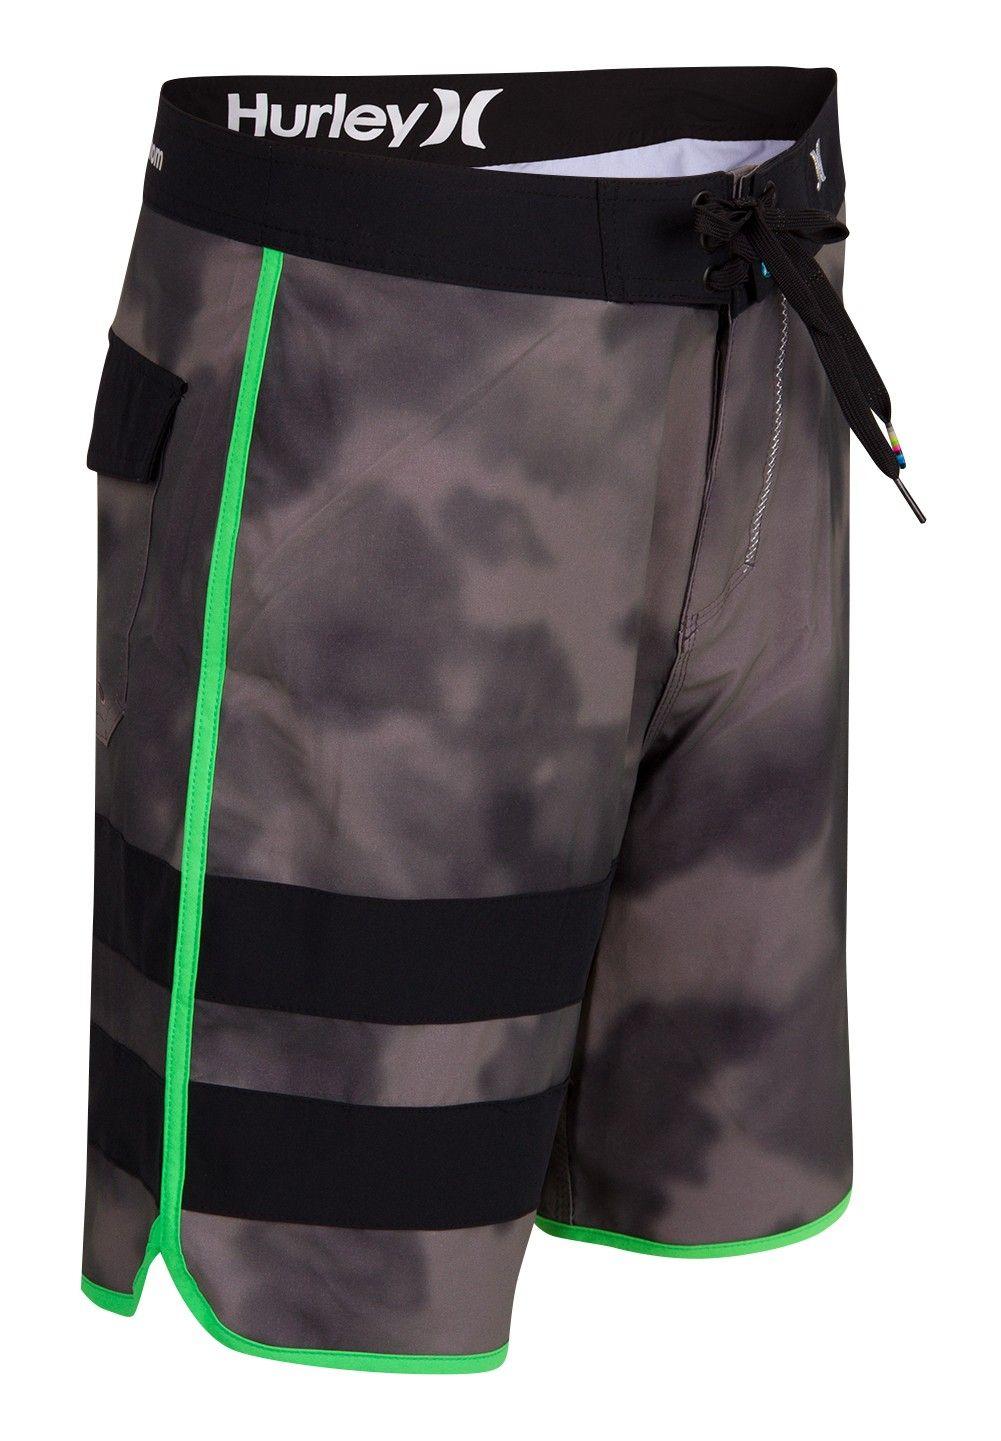 cf3dd04103 Hurley's Tie Dye Block Party Boardshorts | Boardshorts